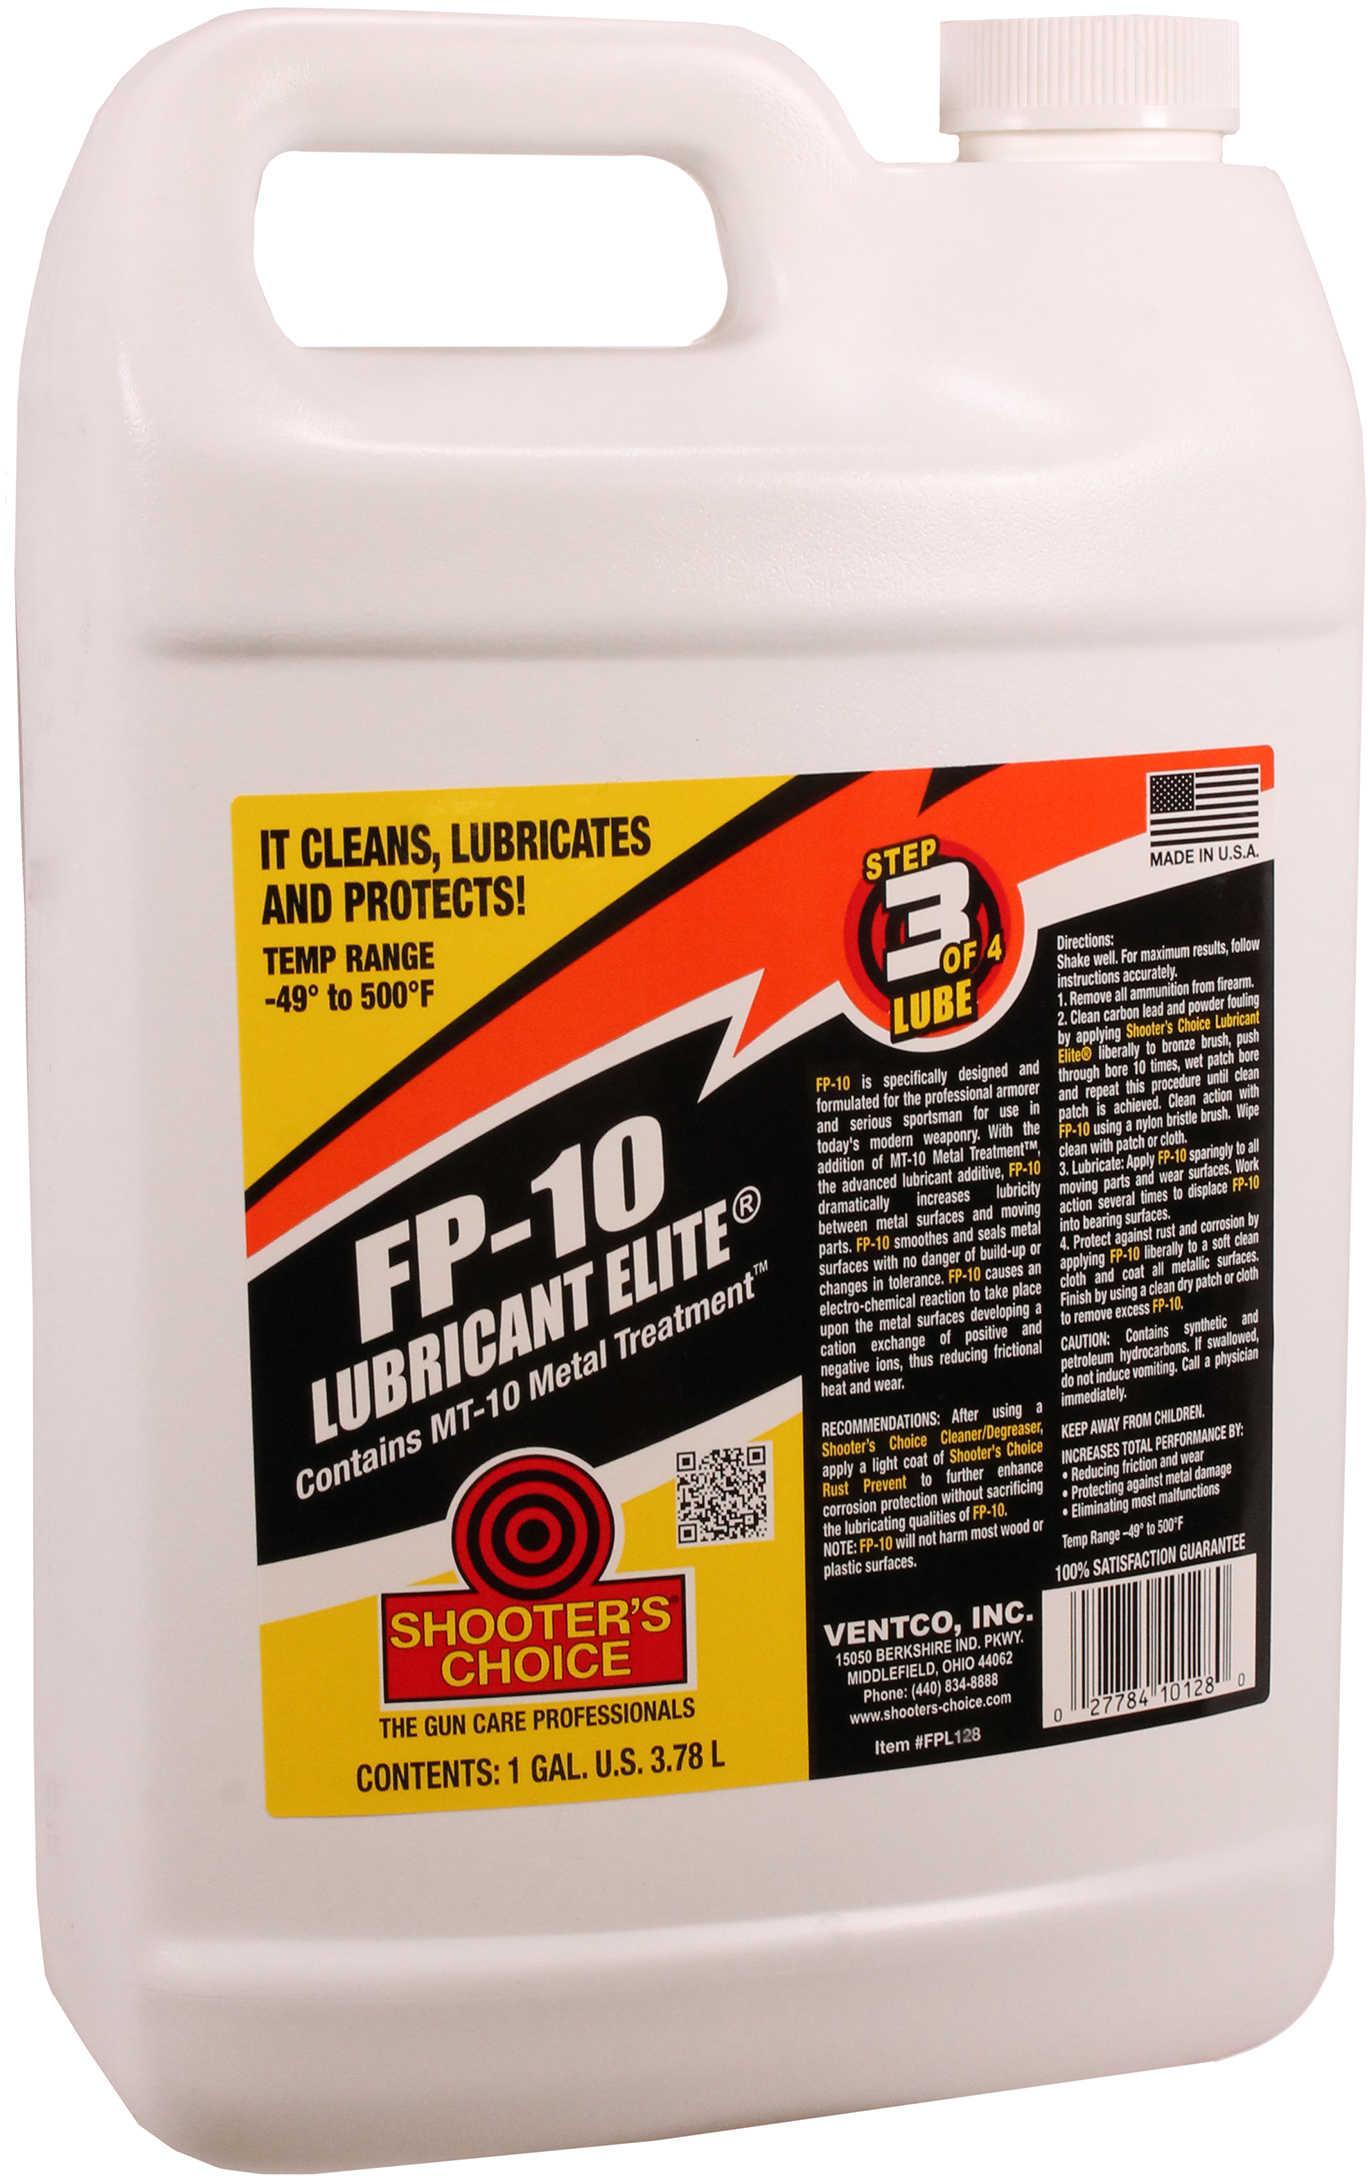 Shooter's Choice FP-10 Gun Lubricant Elite 1 Gallon Hug